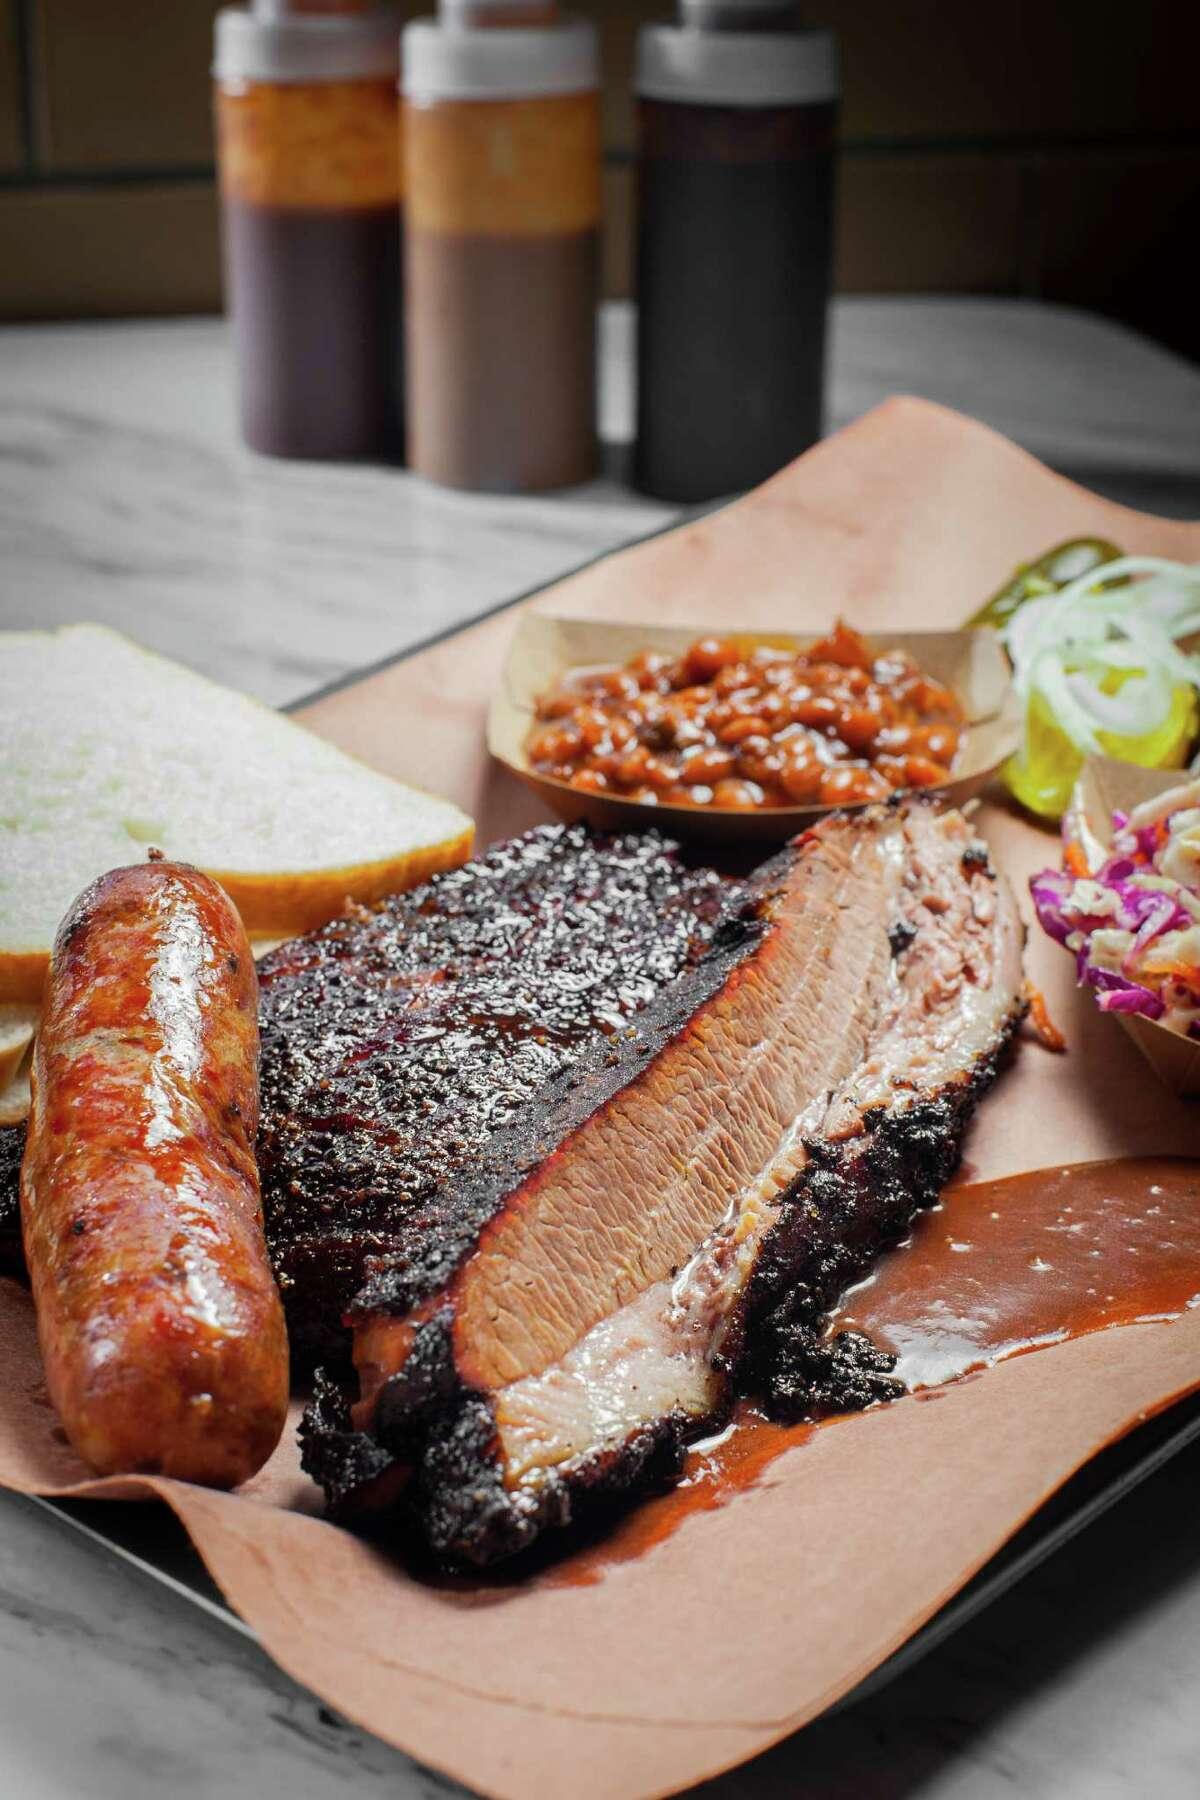 Killen's BBQ's sausage link, pork ribs, beans and coleslaw.